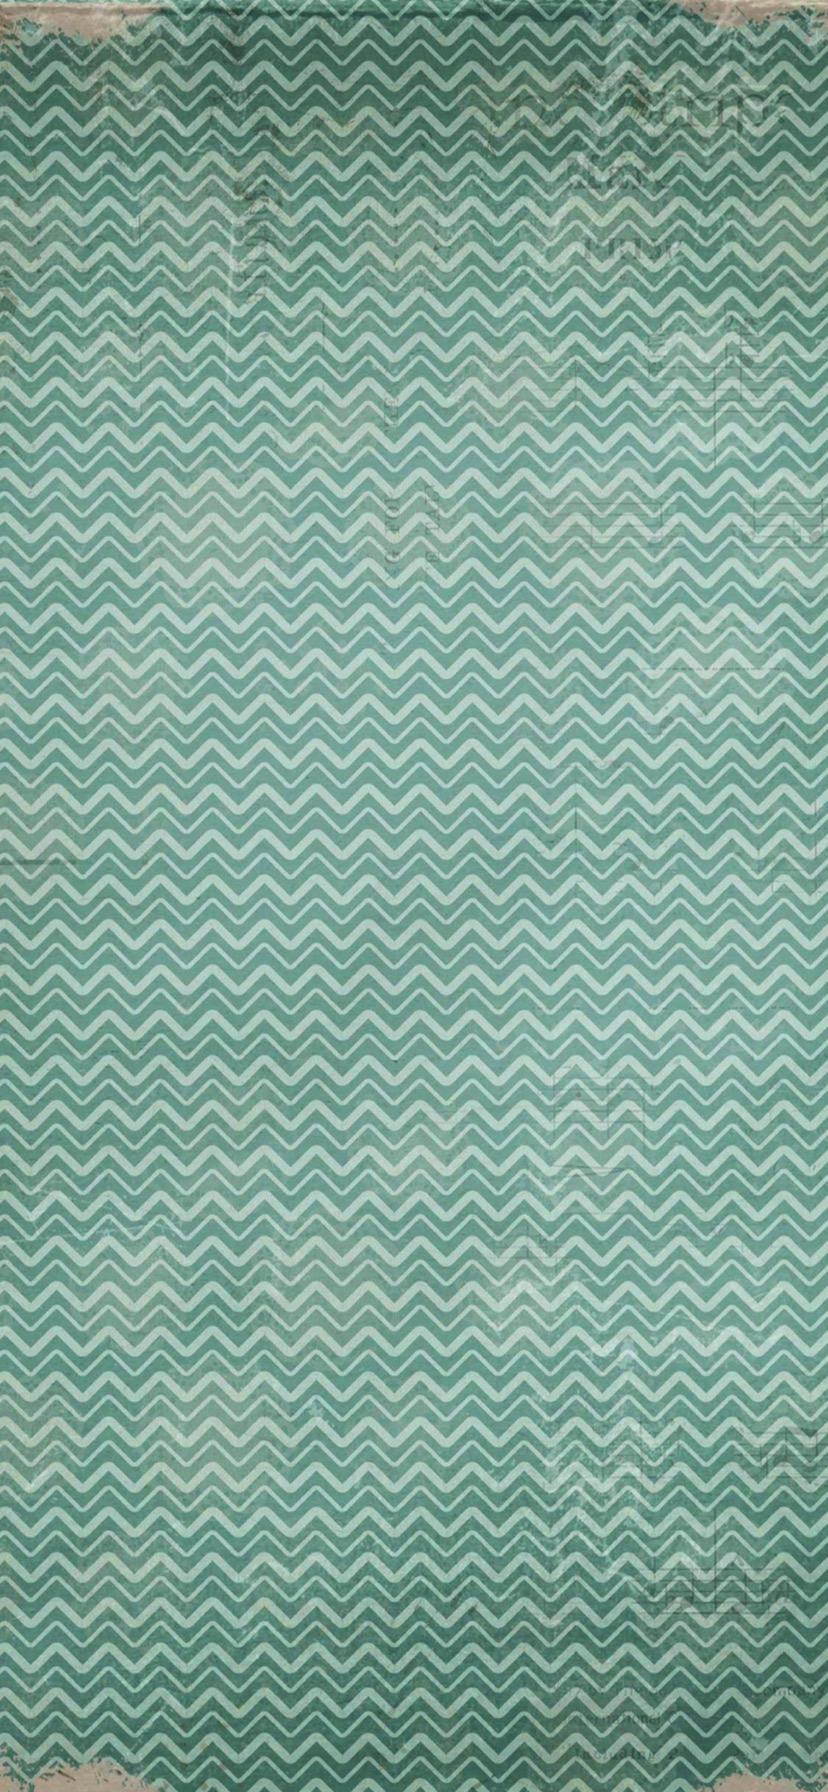 iPhone XR 壁紙 wallpaper 0288